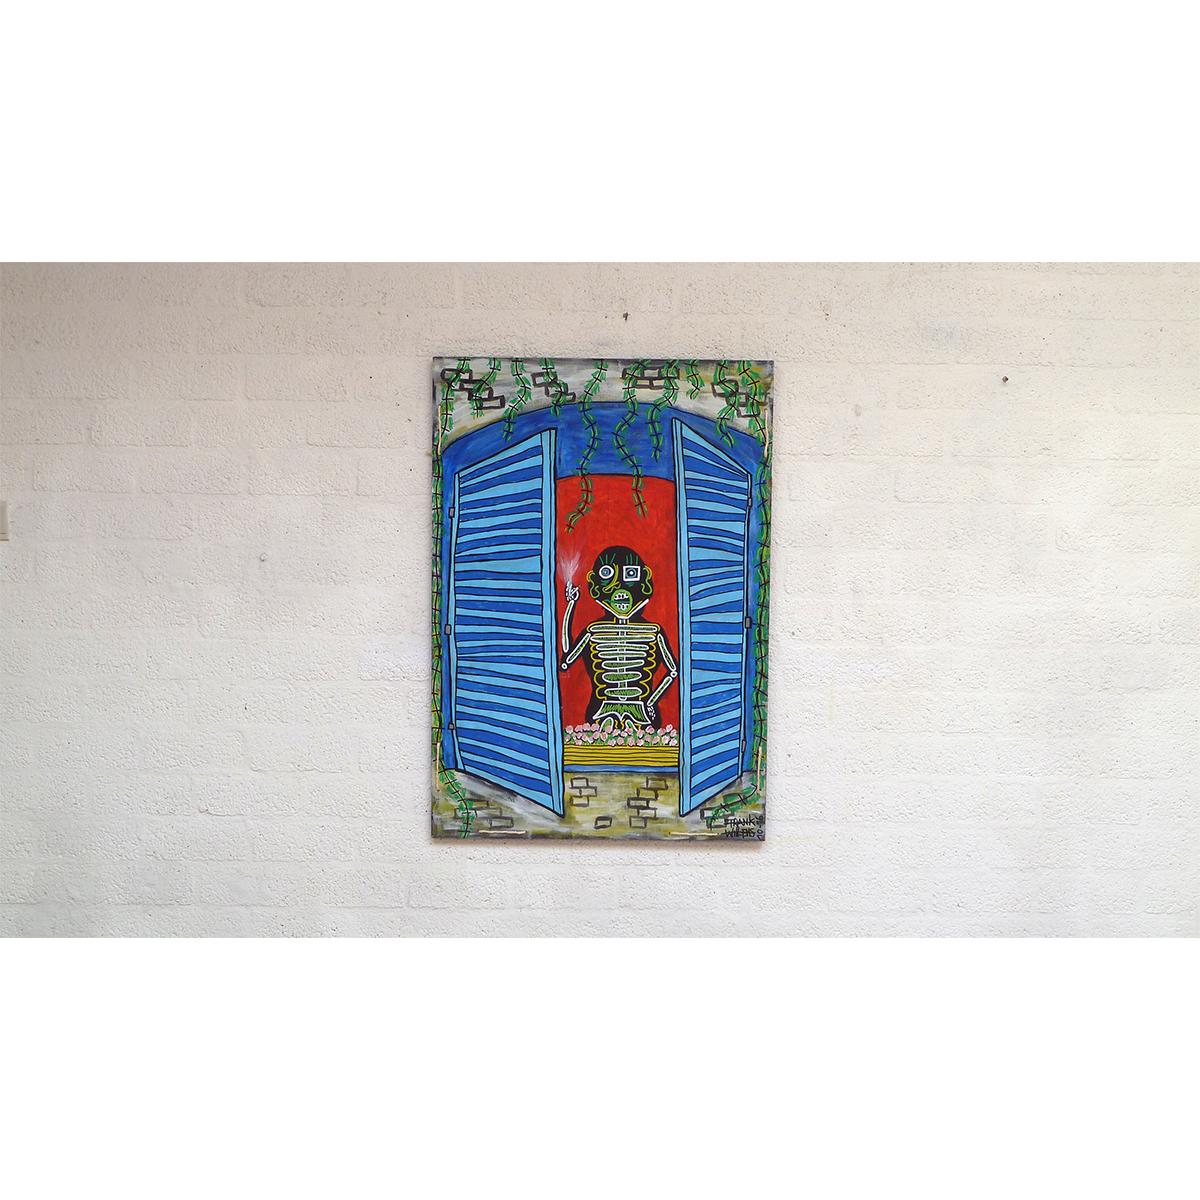 FRENCH WINDOW SMOKER 02 - Frank Willems